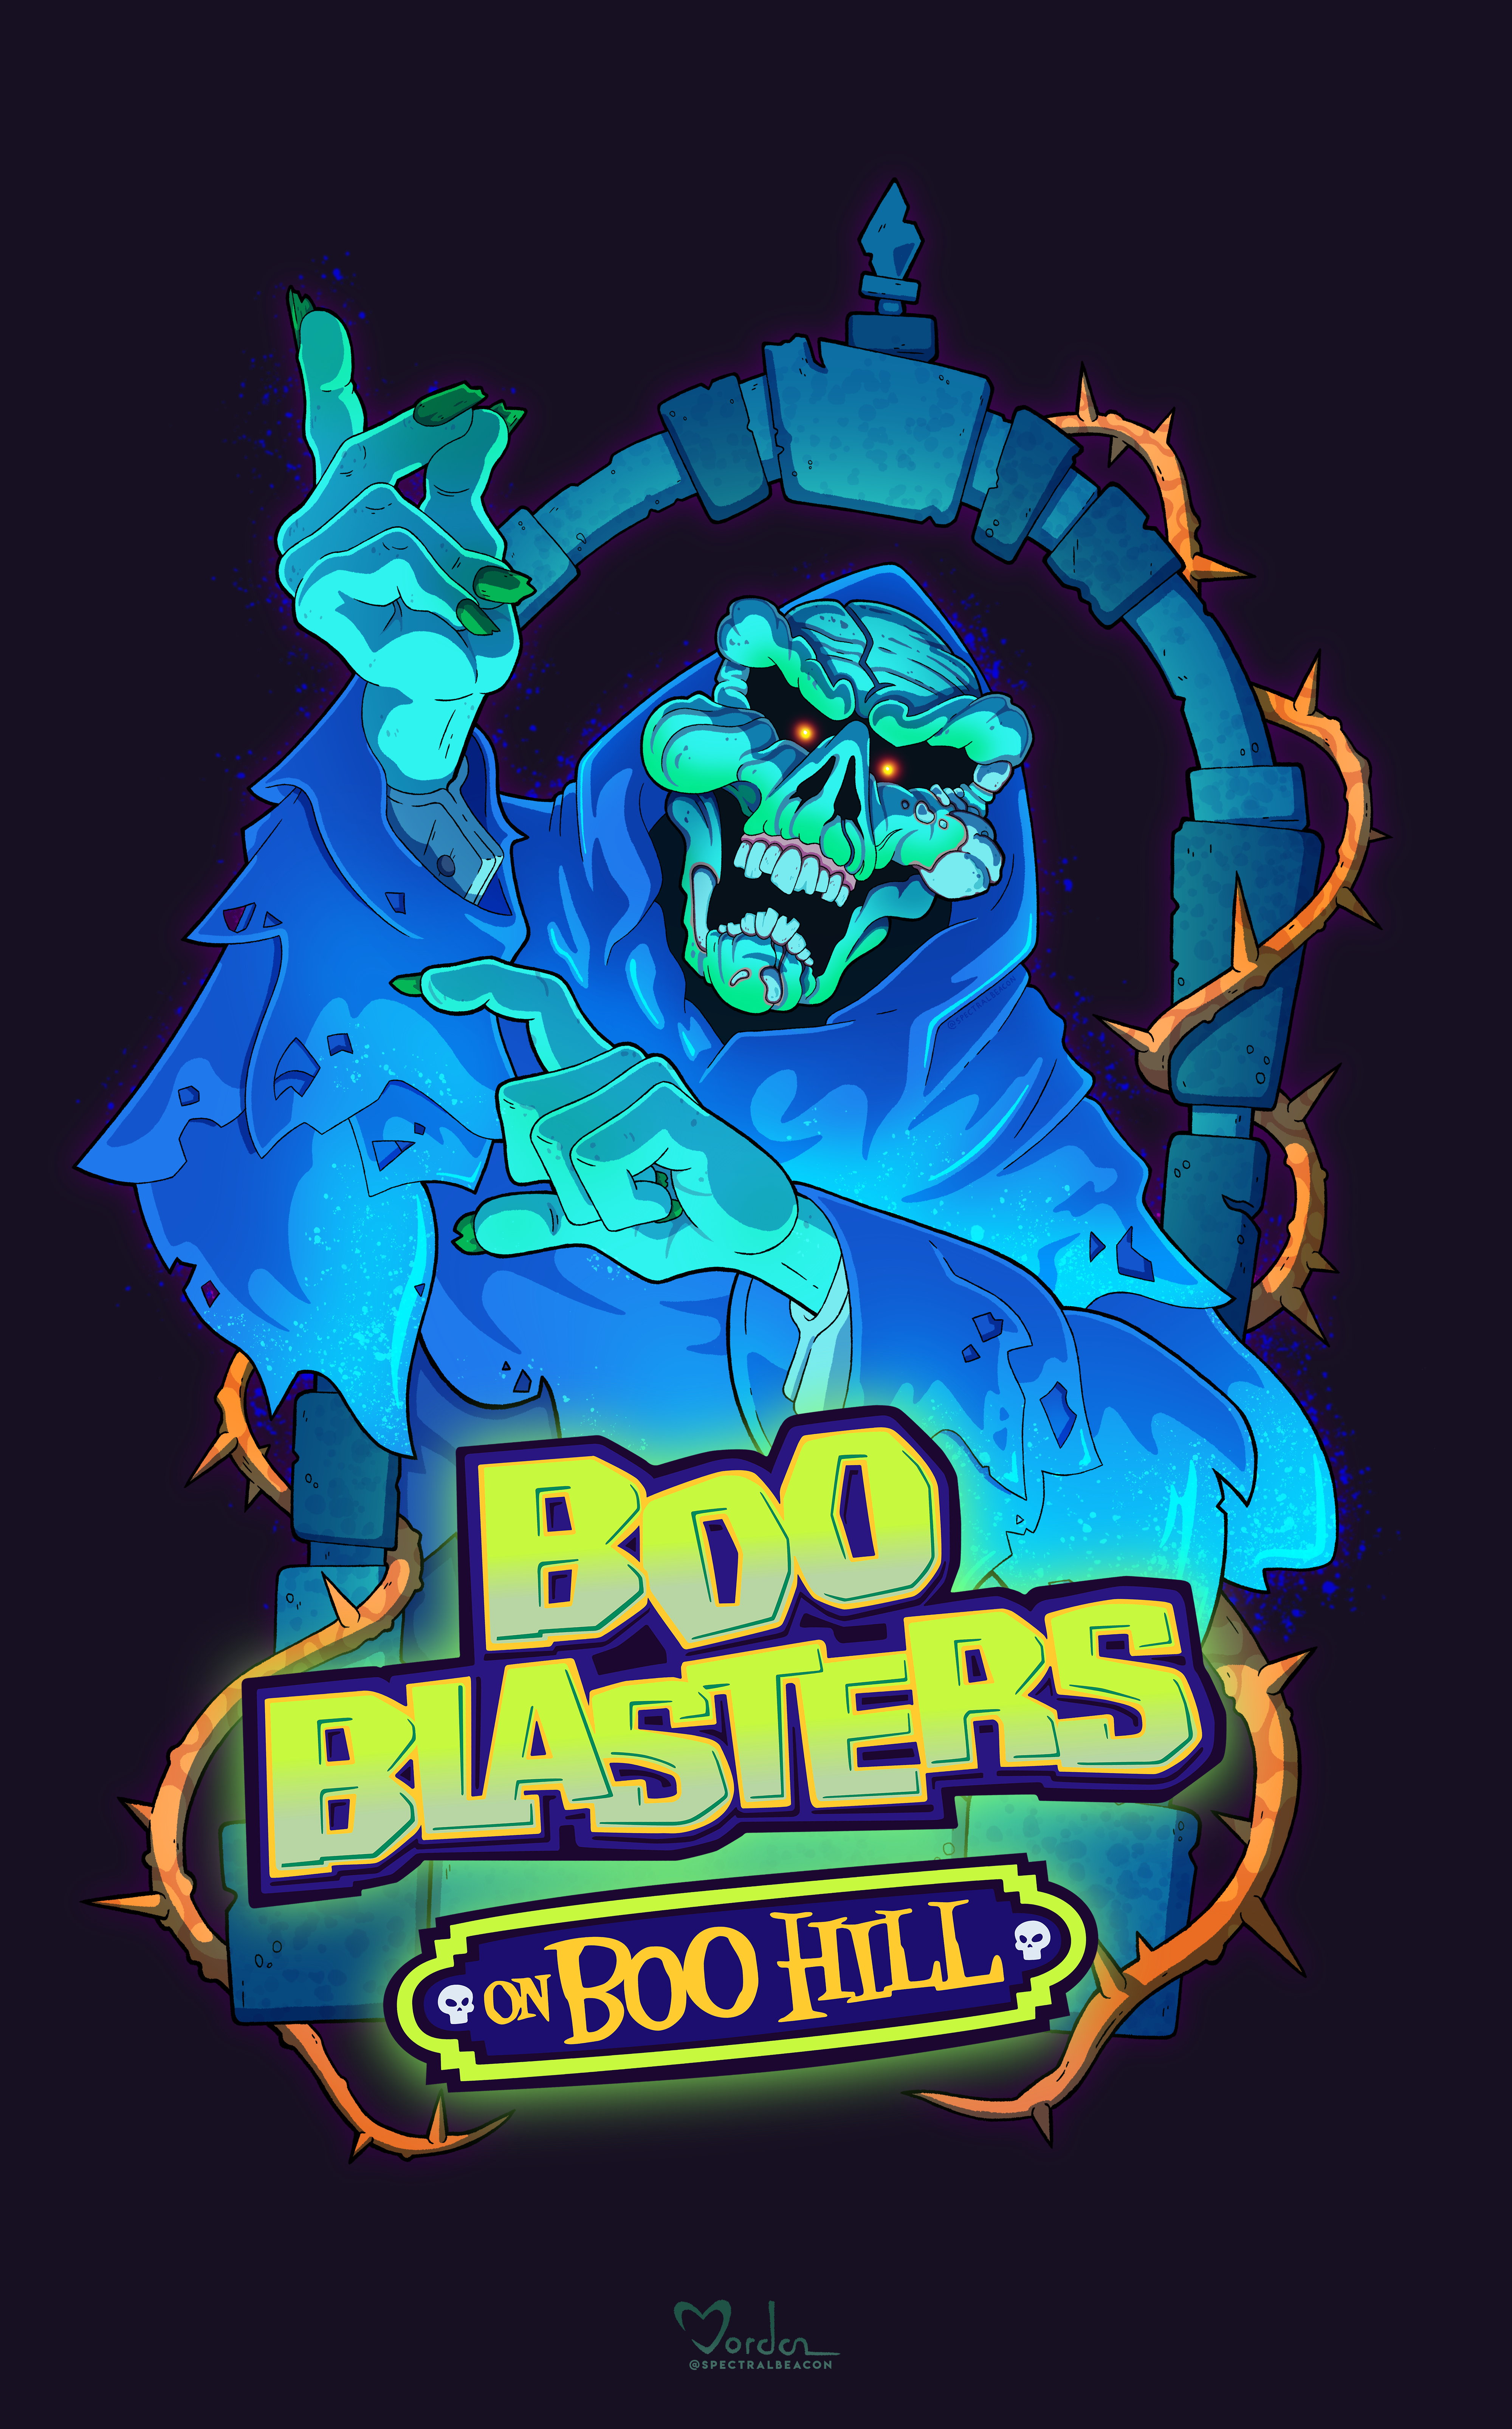 Boocifer!